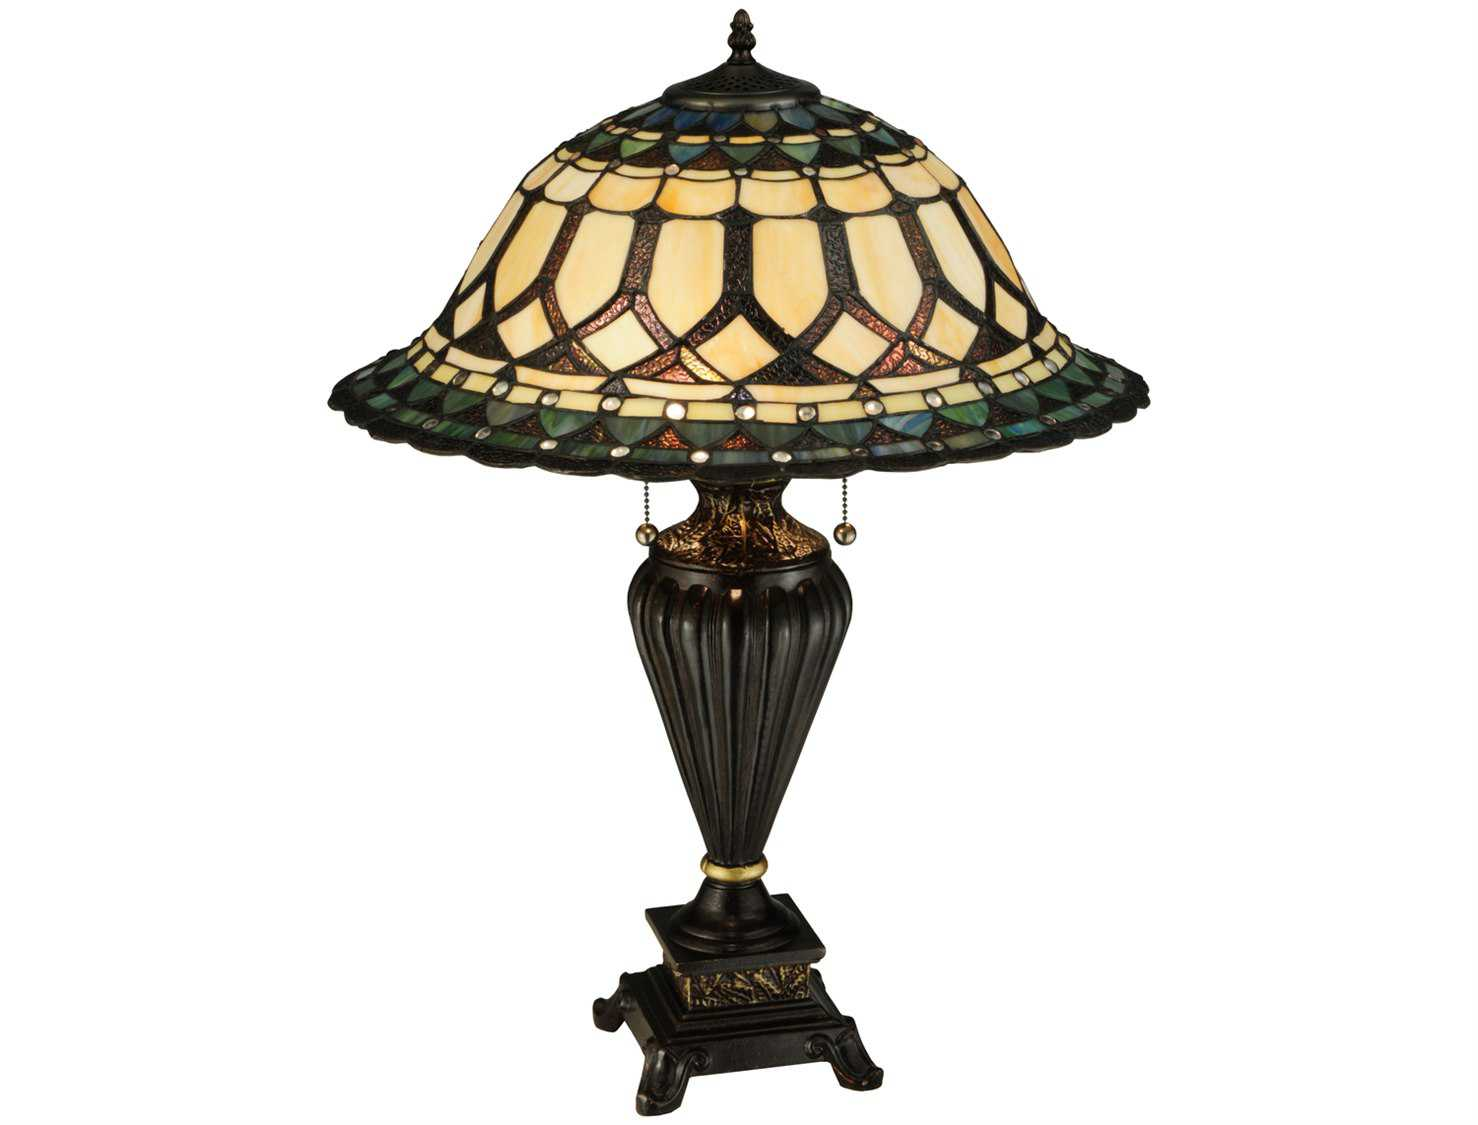 meyda tiffany aello multi color table lamp 134536. Black Bedroom Furniture Sets. Home Design Ideas